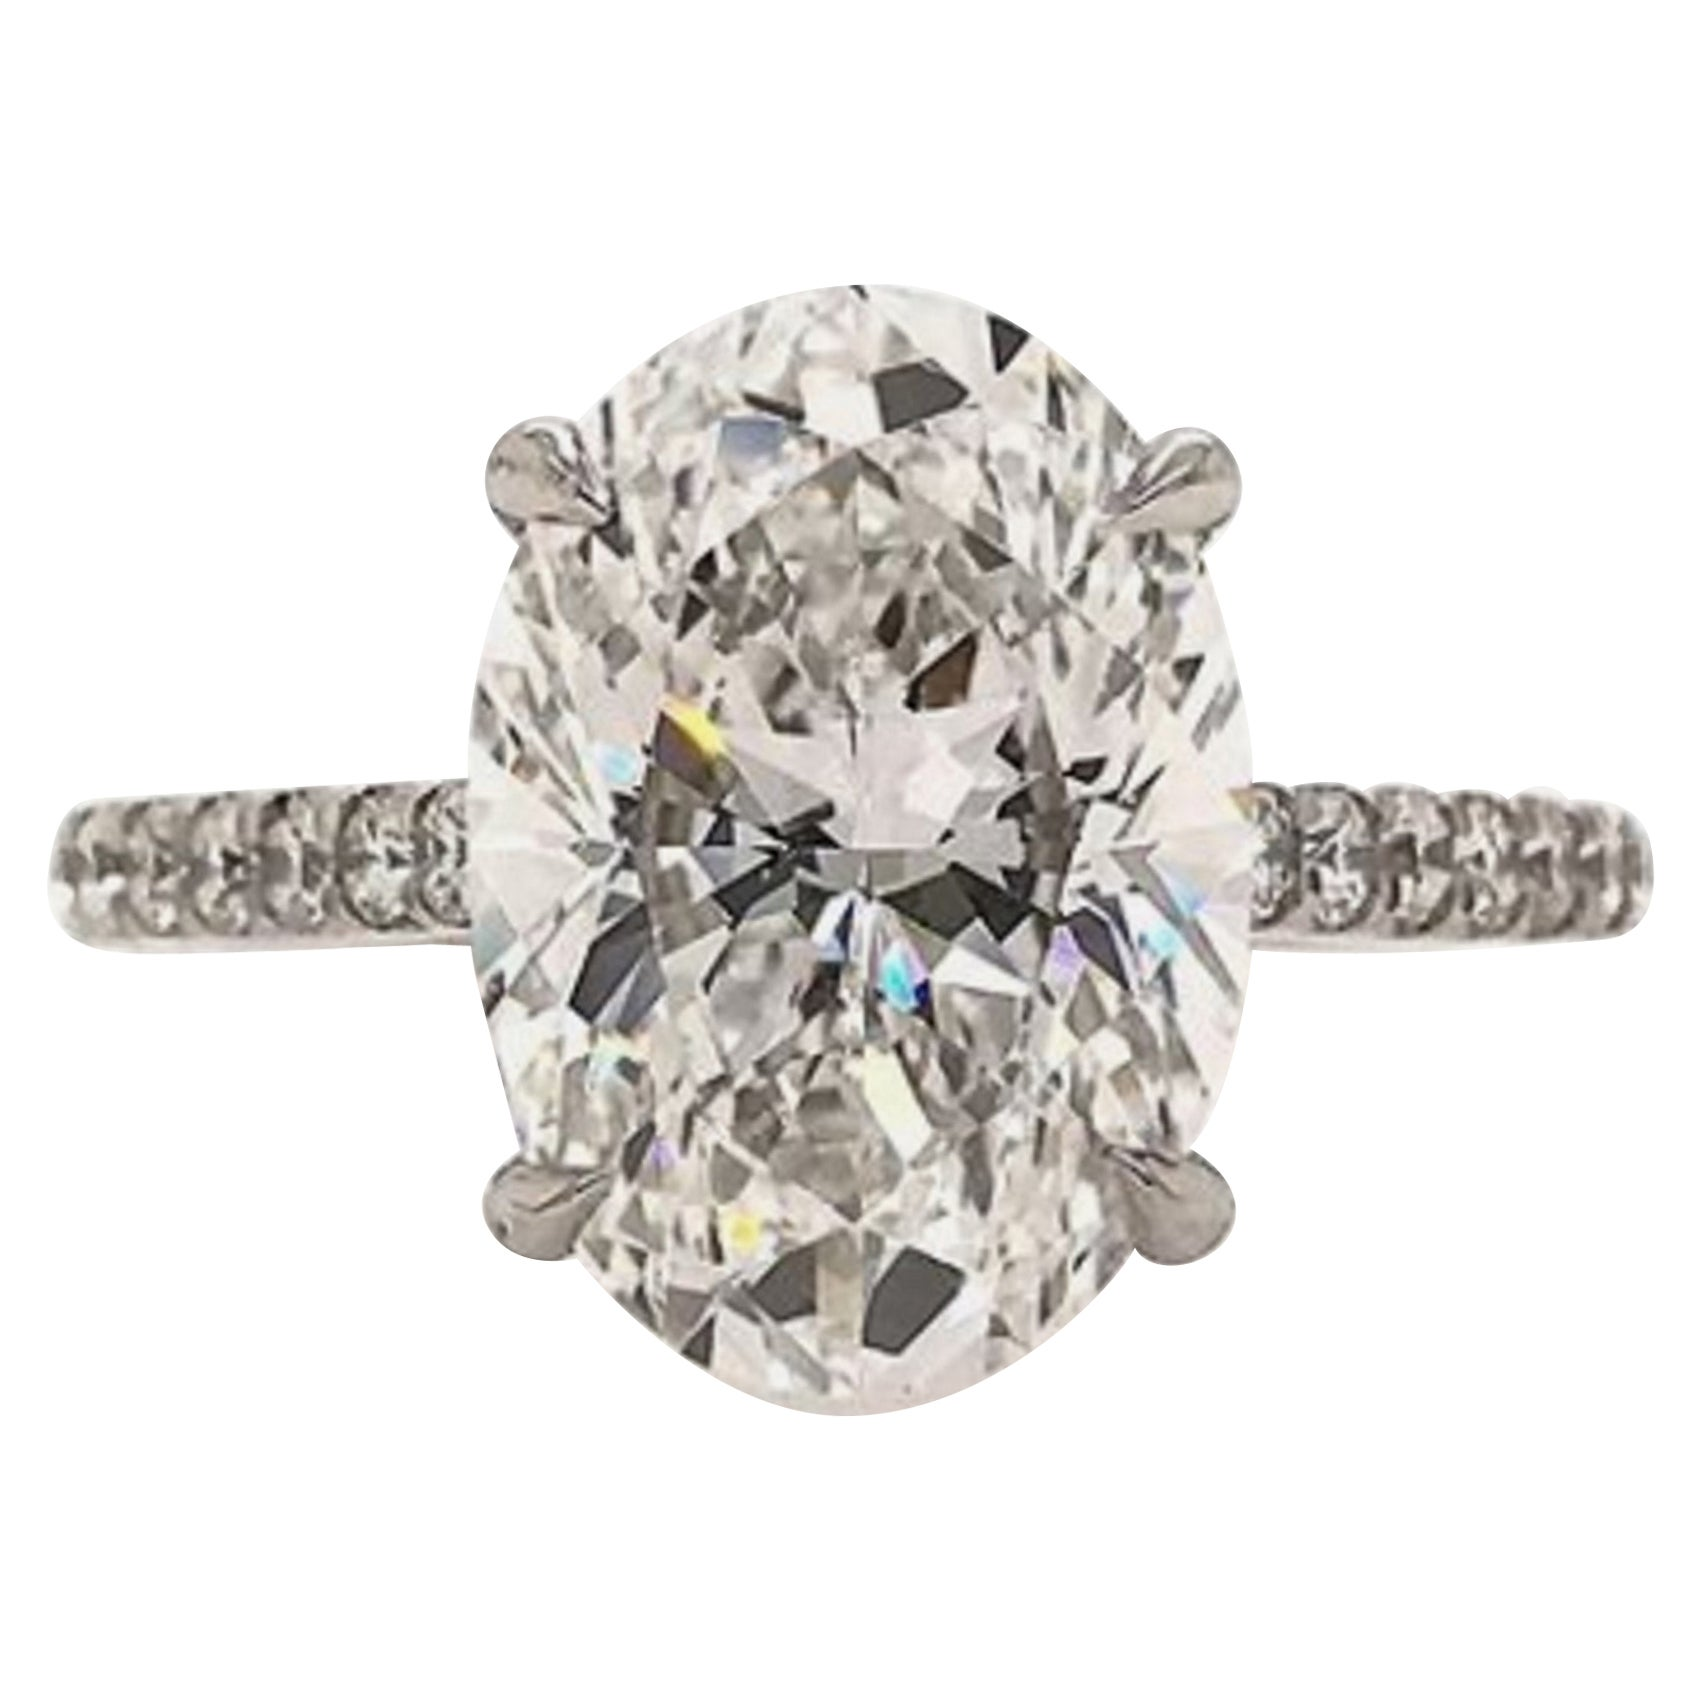 GIA Certified 4 Carat Oval Natural Diamond Ring